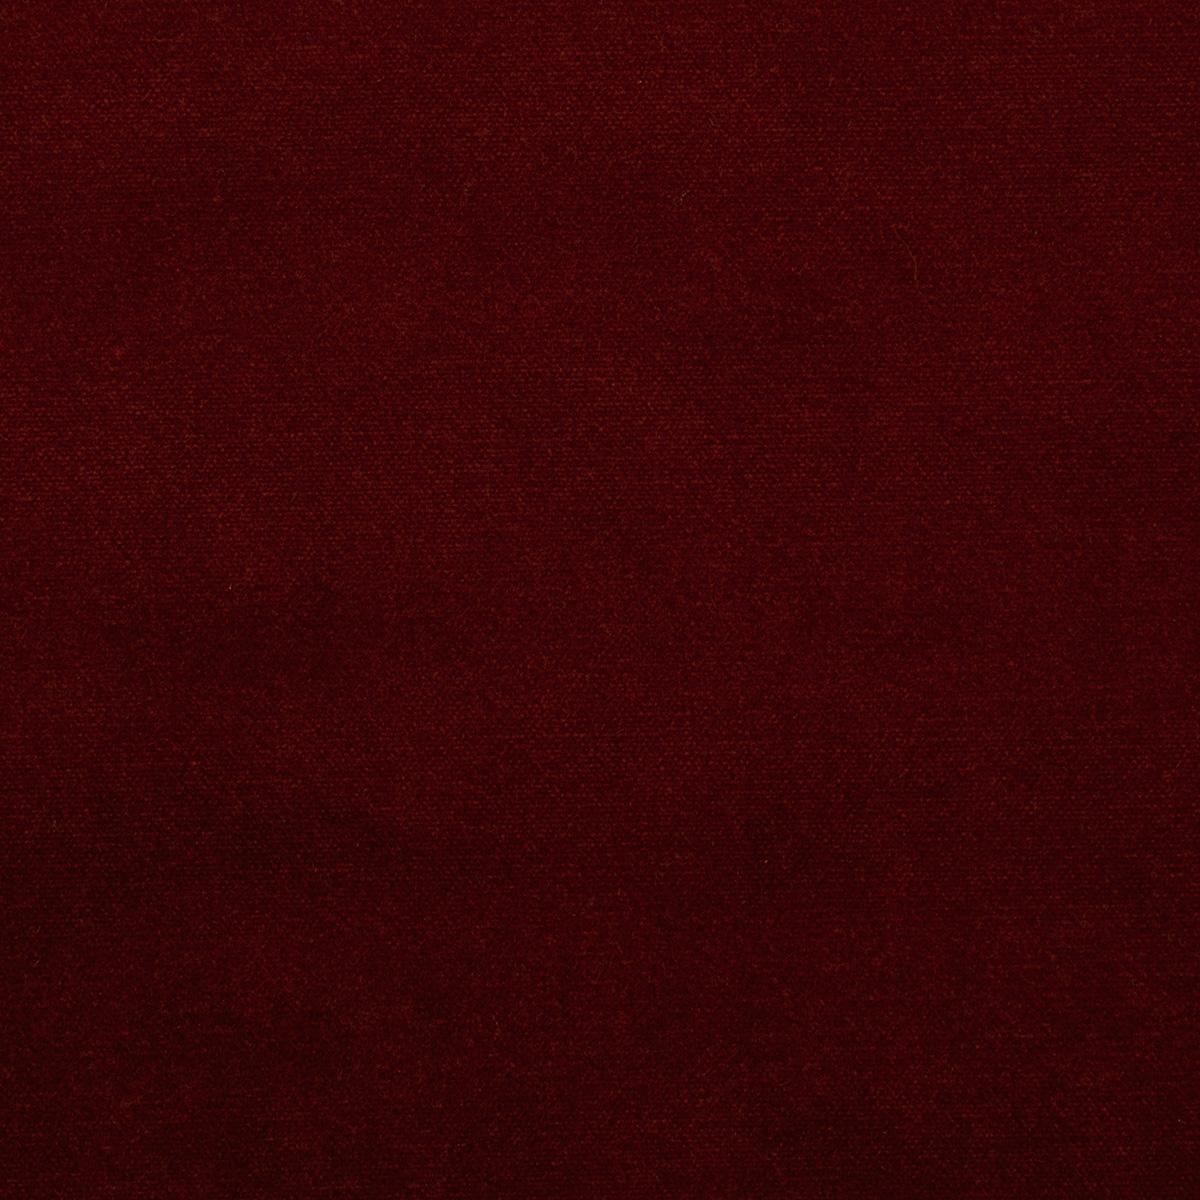 9a5fe7c013 Panache Velvet Mulberry | Fabric | Fabricut Contract